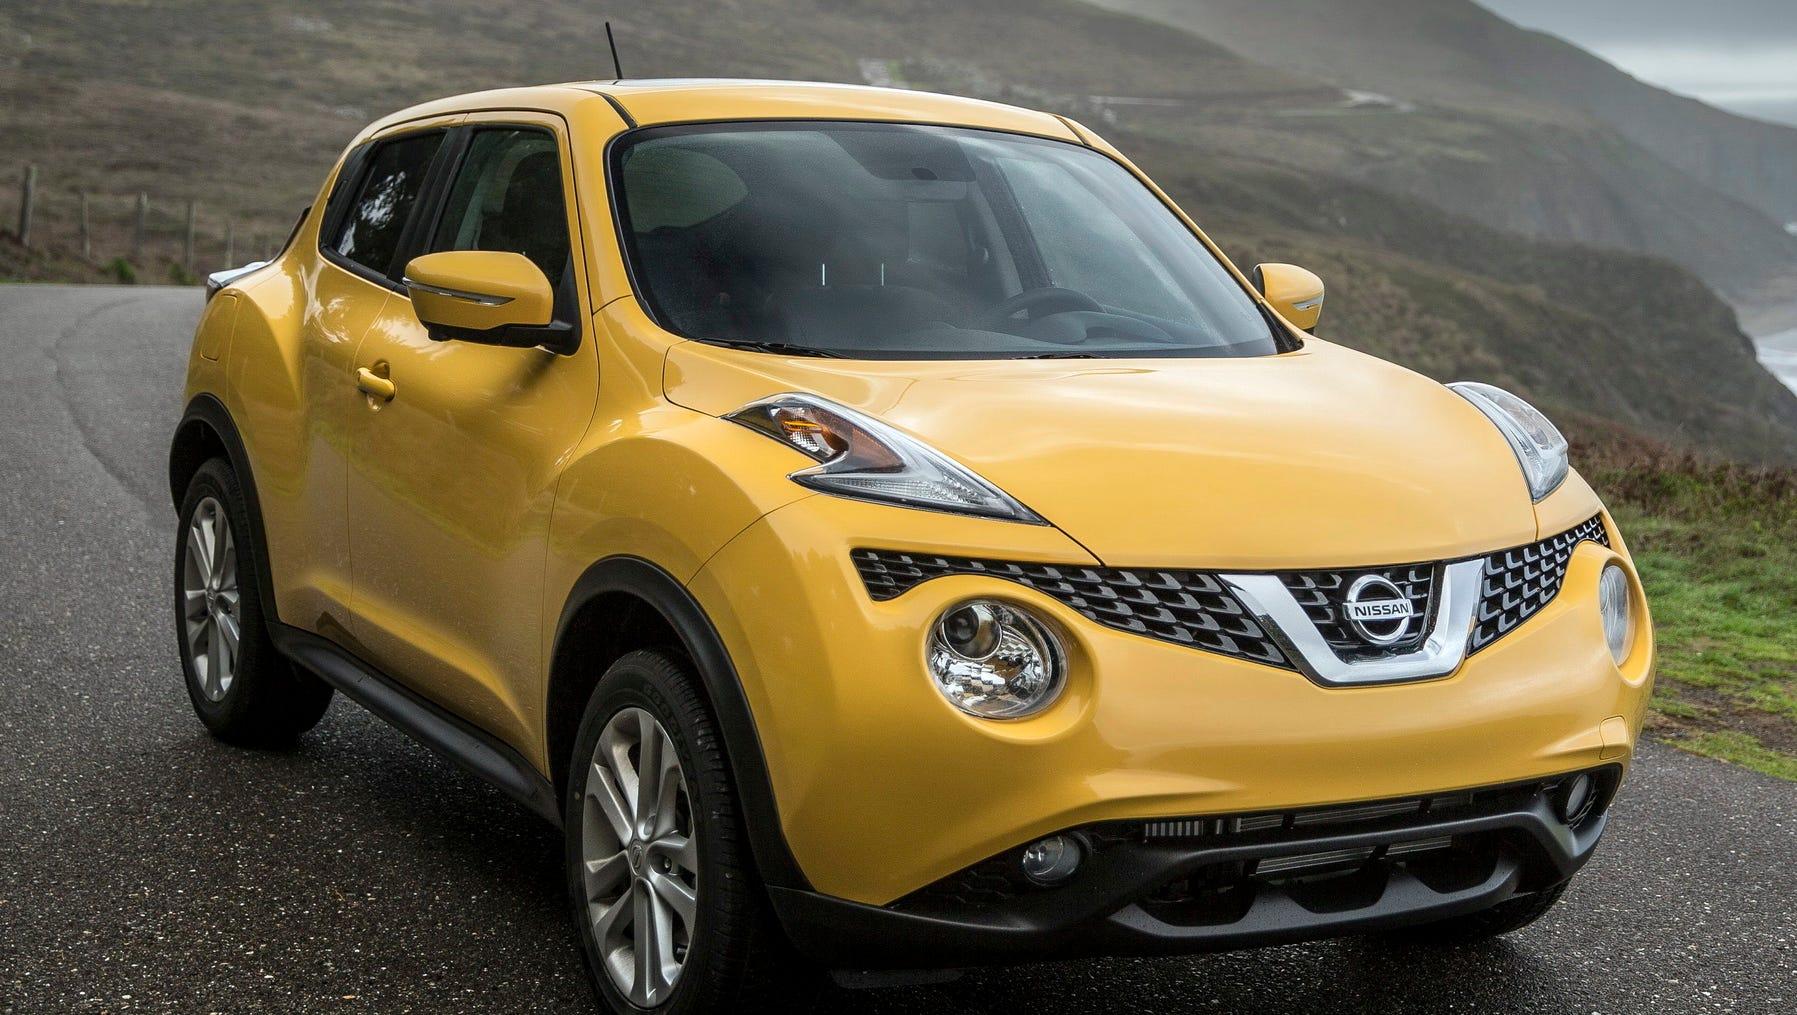 Roadworthy Motor News Media Corp Test Drives The New Nissan Juke Sport Cross